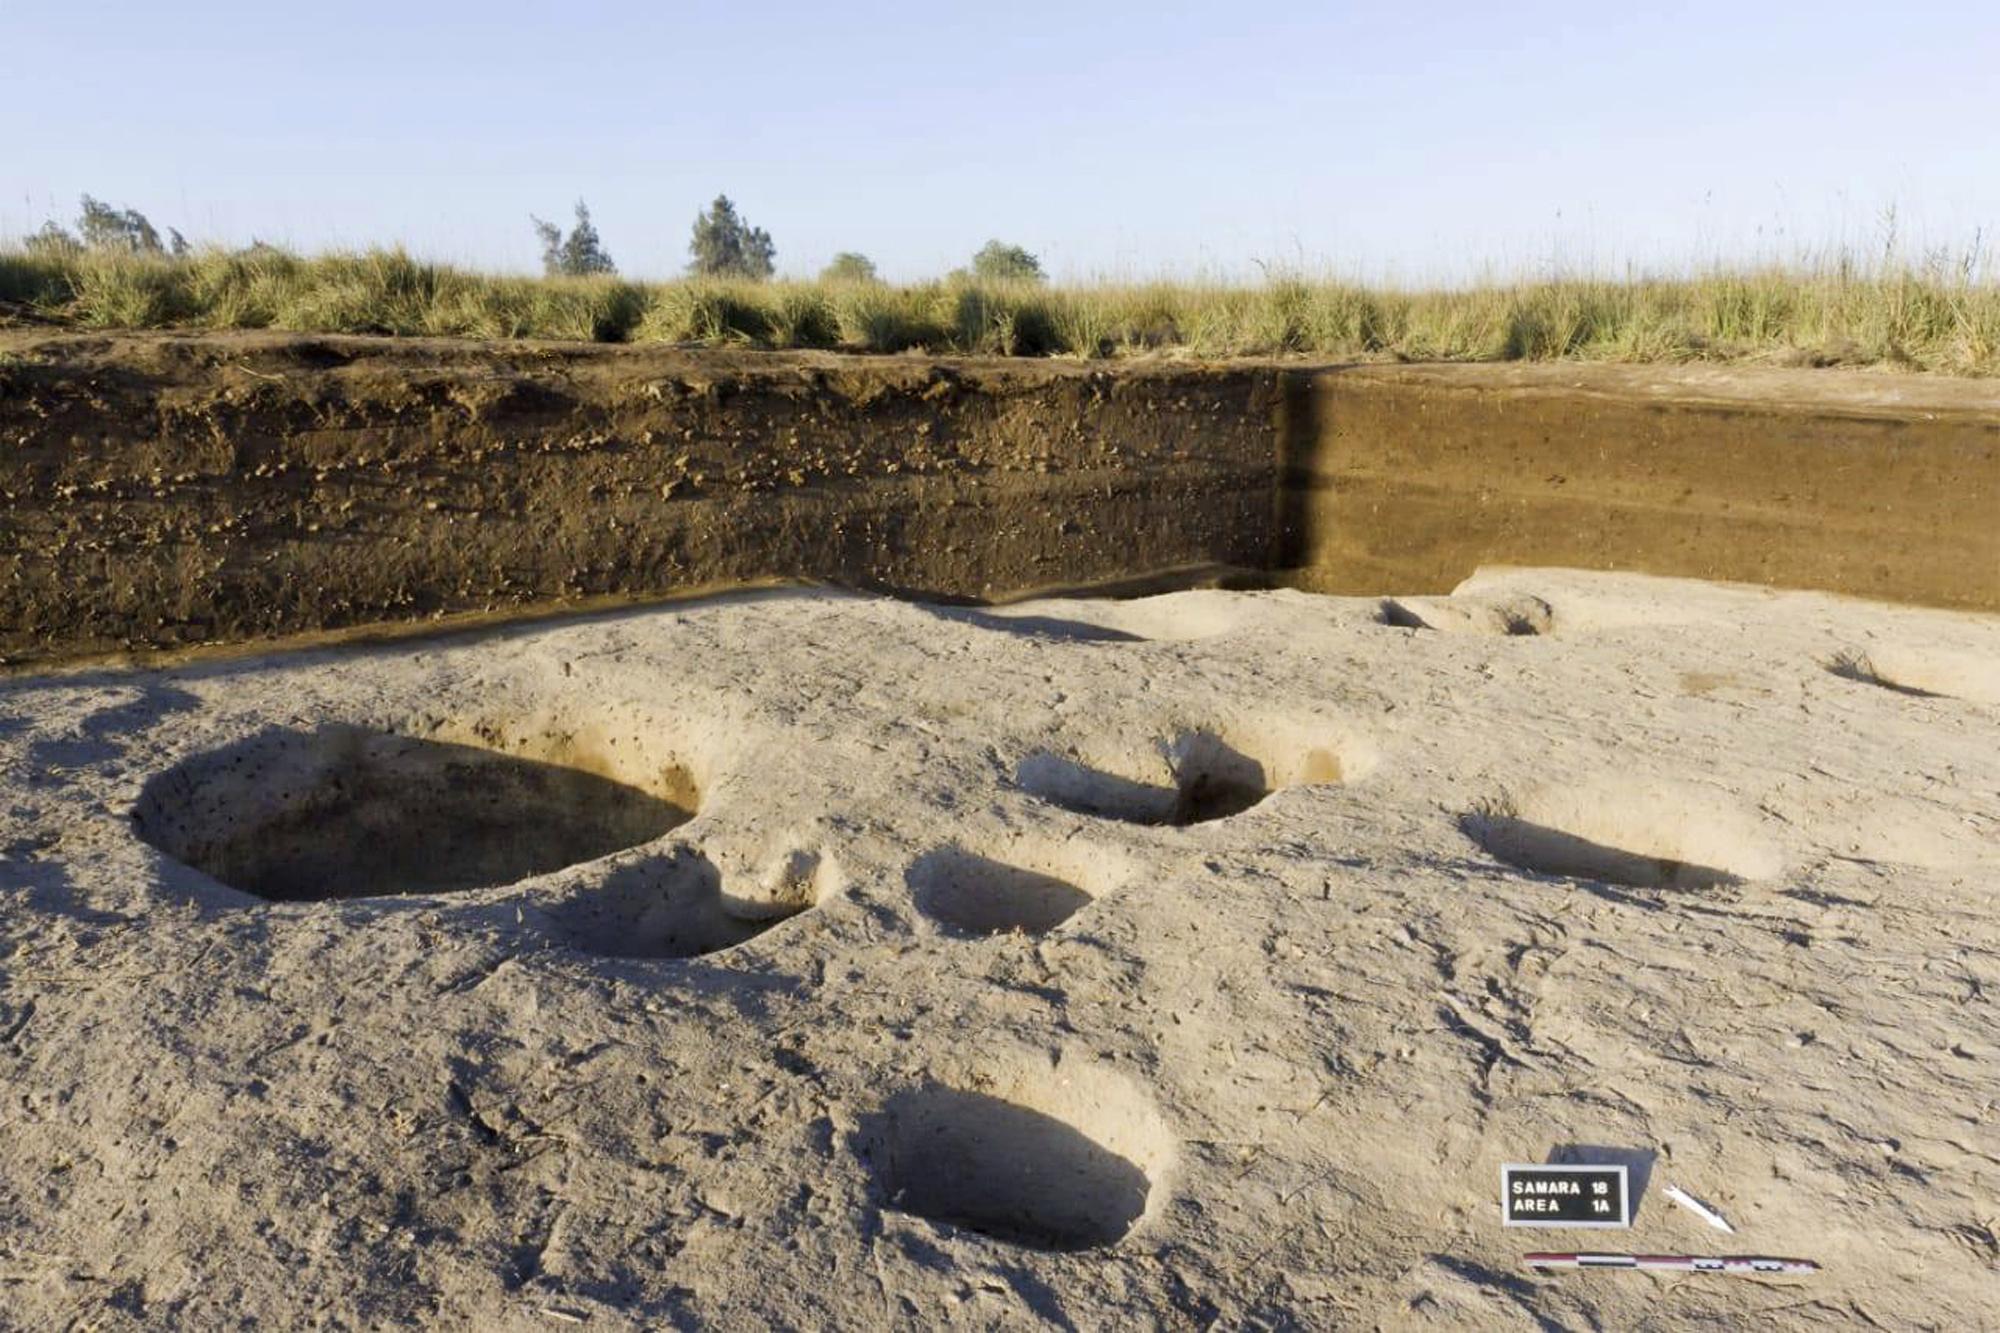 Egypt: Village Found in Nile Delta Predated Pharaohs